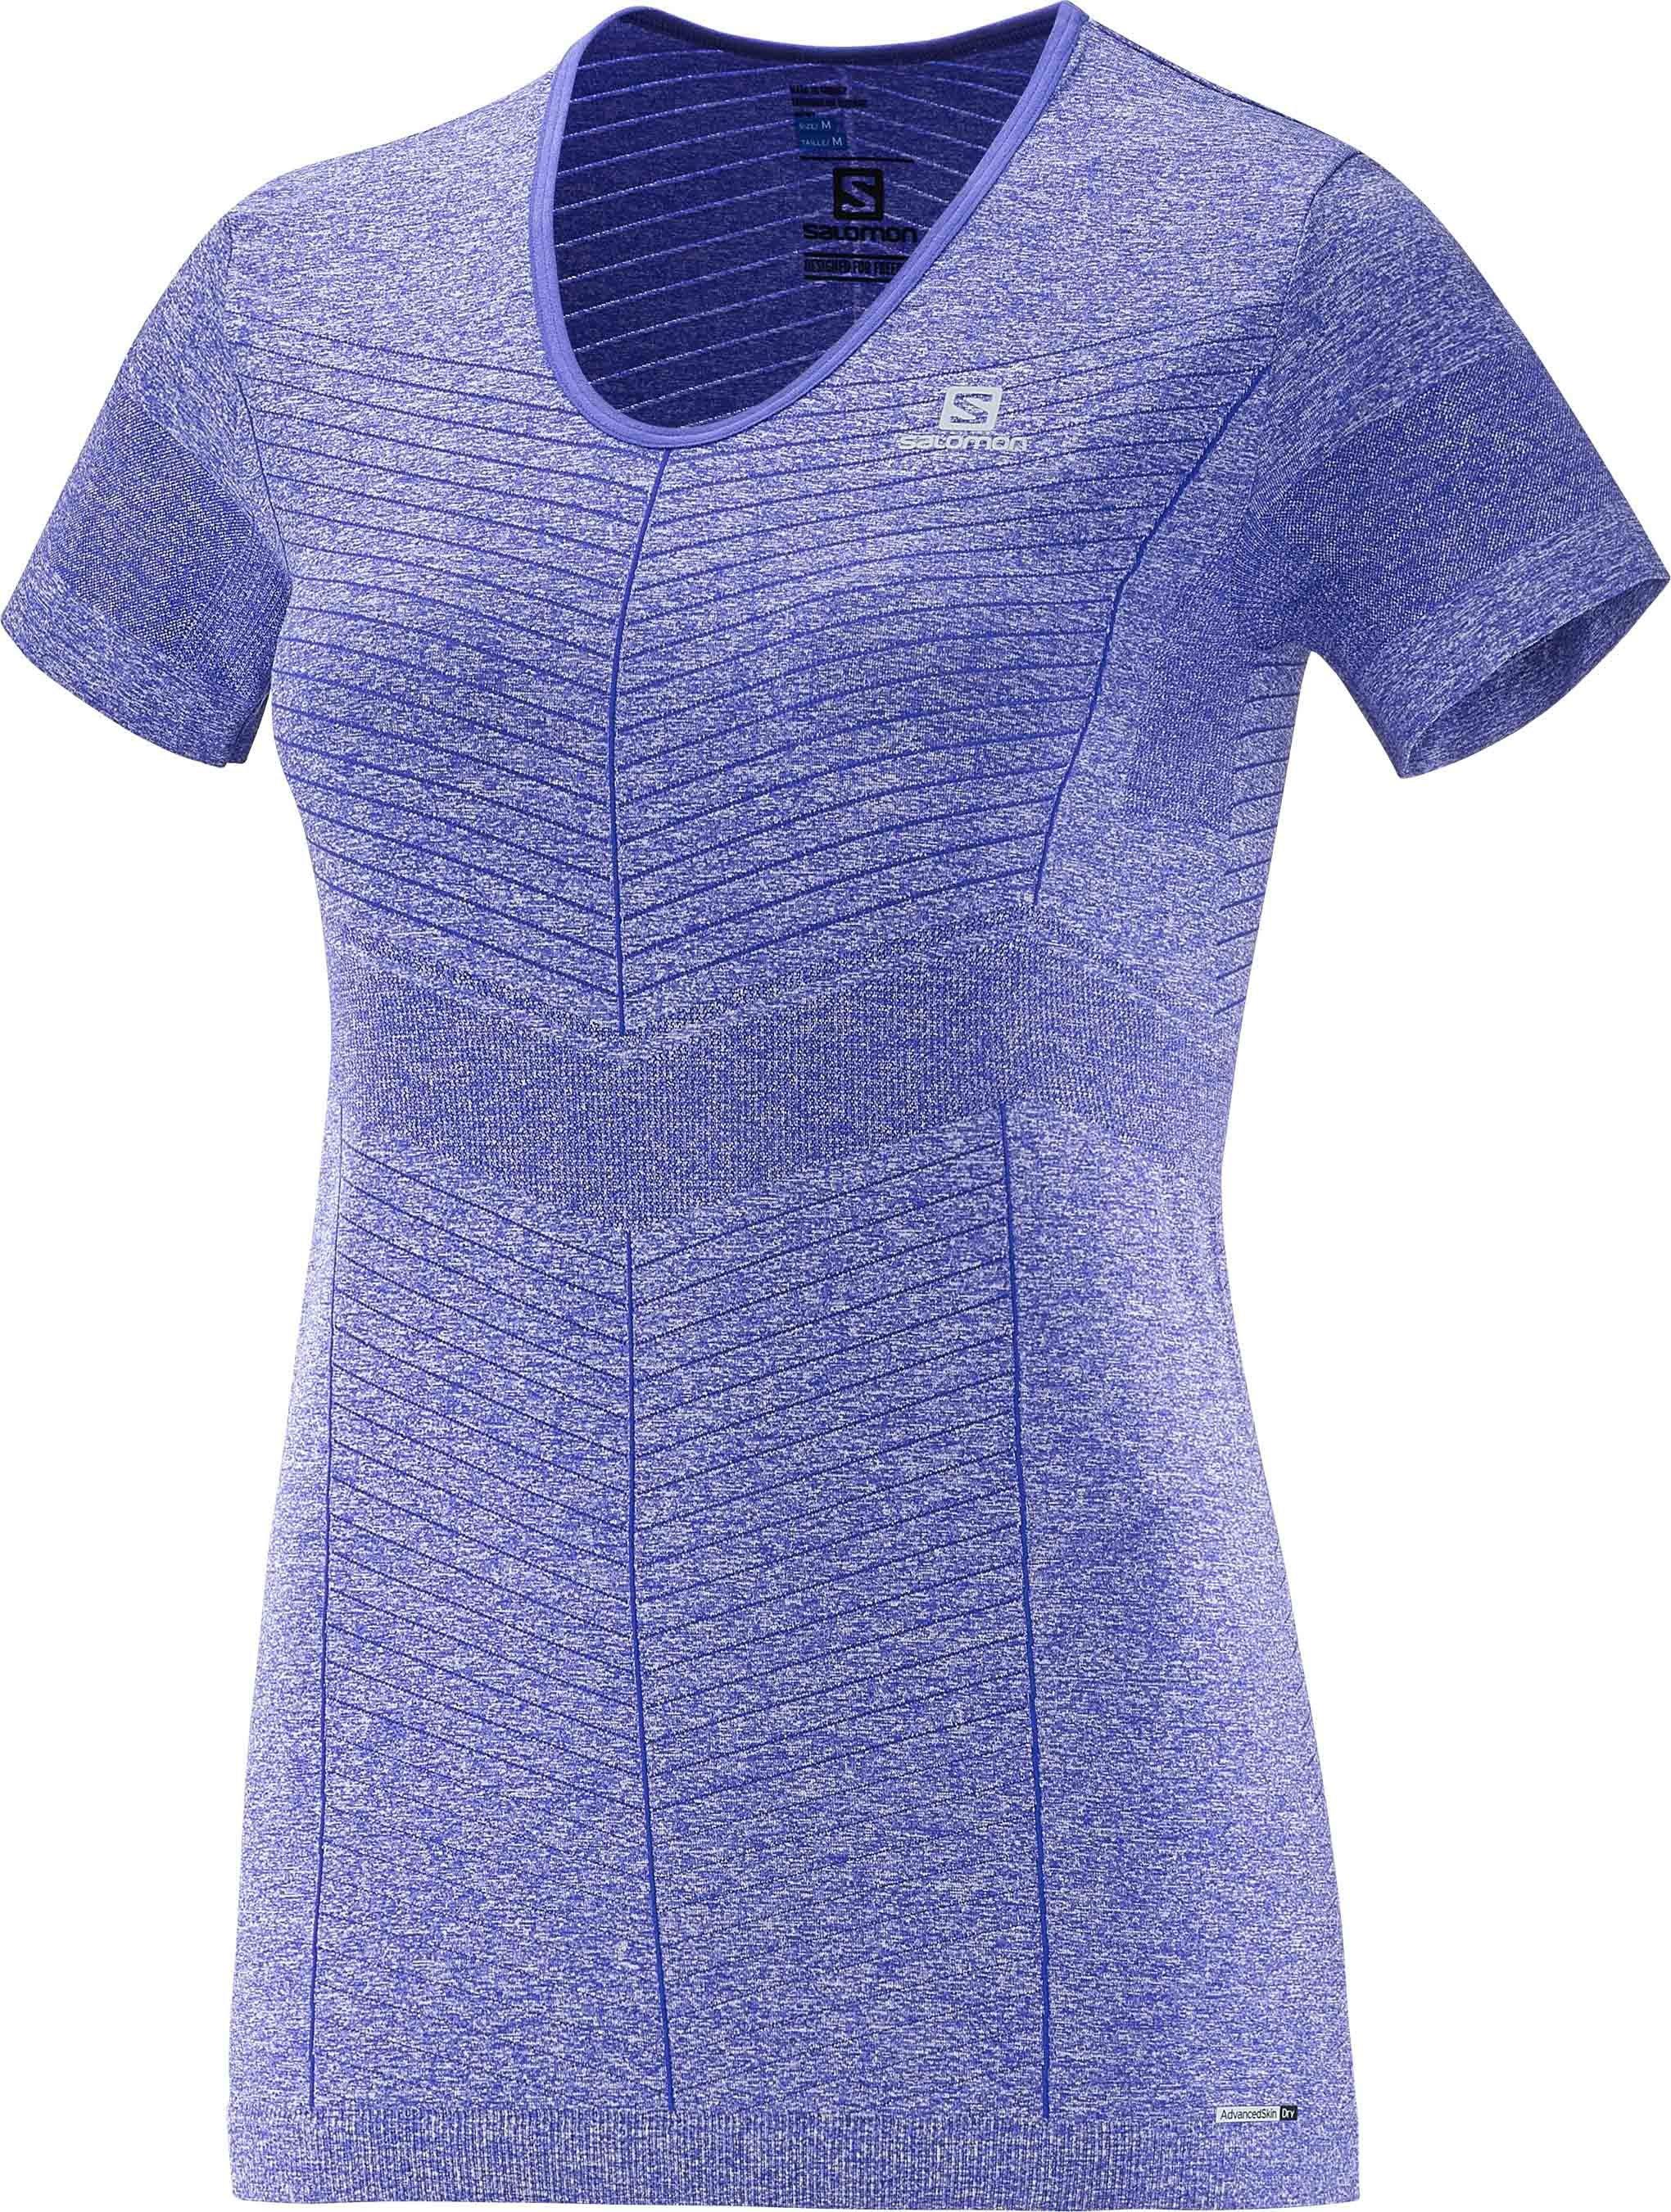 Běžecké tričko s krátkým rukávem Salomon Elevate Seamless